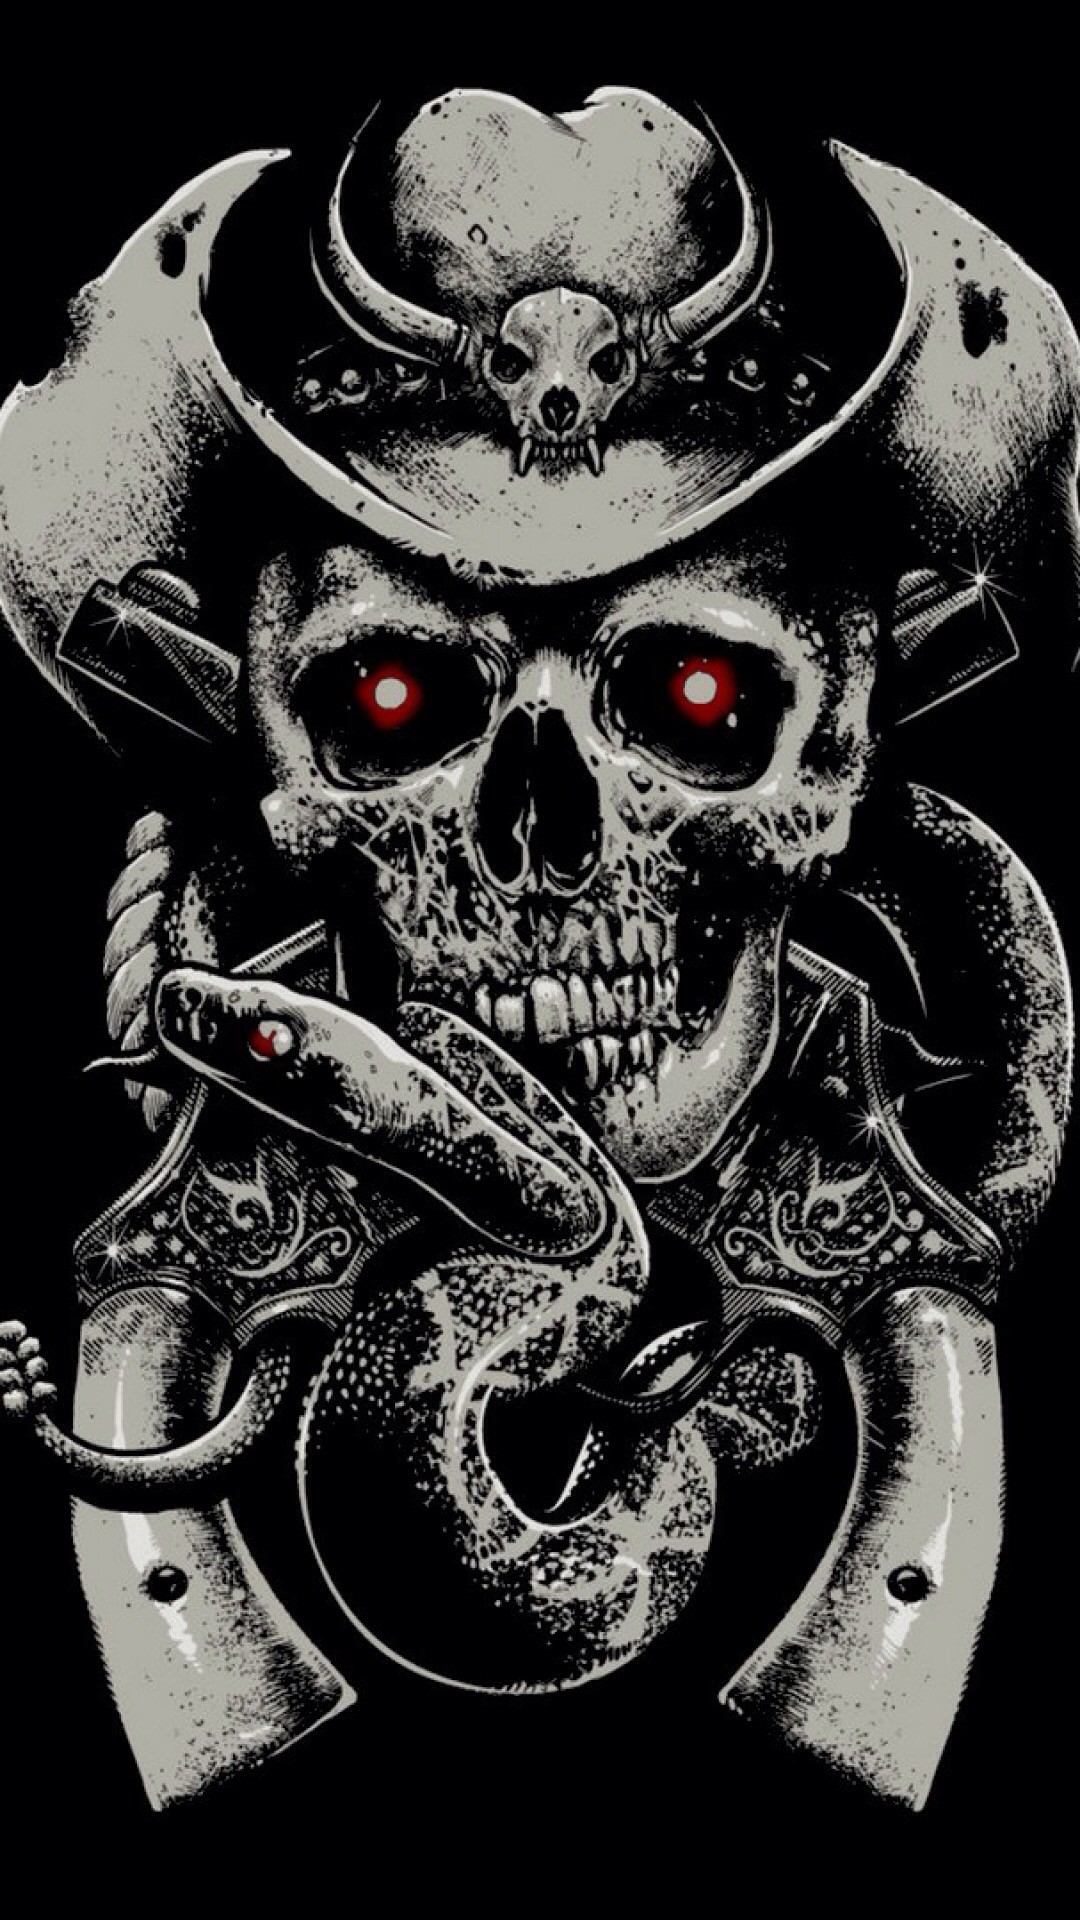 Punk Skull Wallpaper 45 Pictures